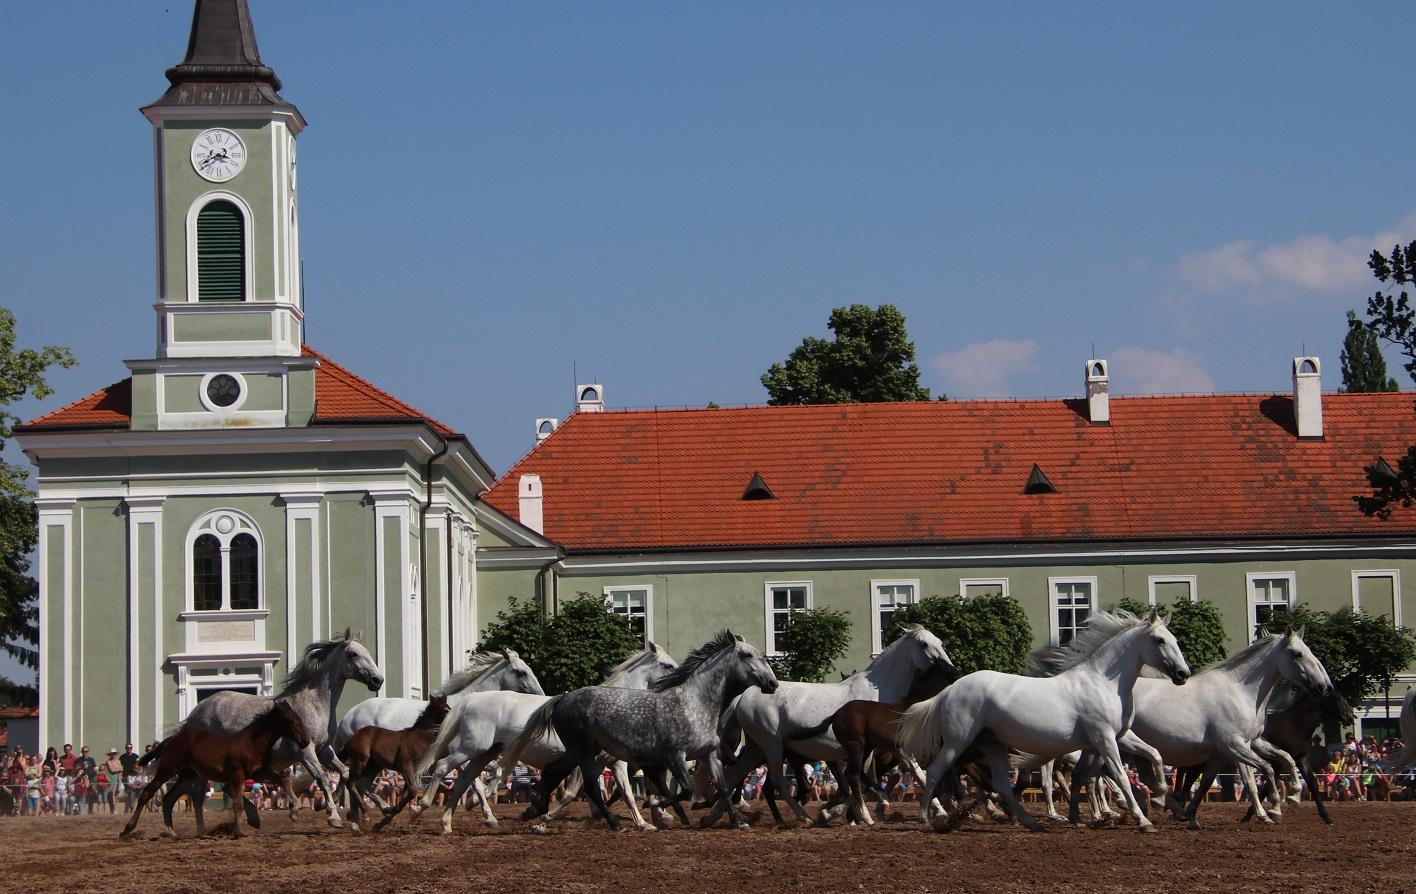 Kladruby nad Labem: Habsburg Stud  now a UNESCO World Heritage Site